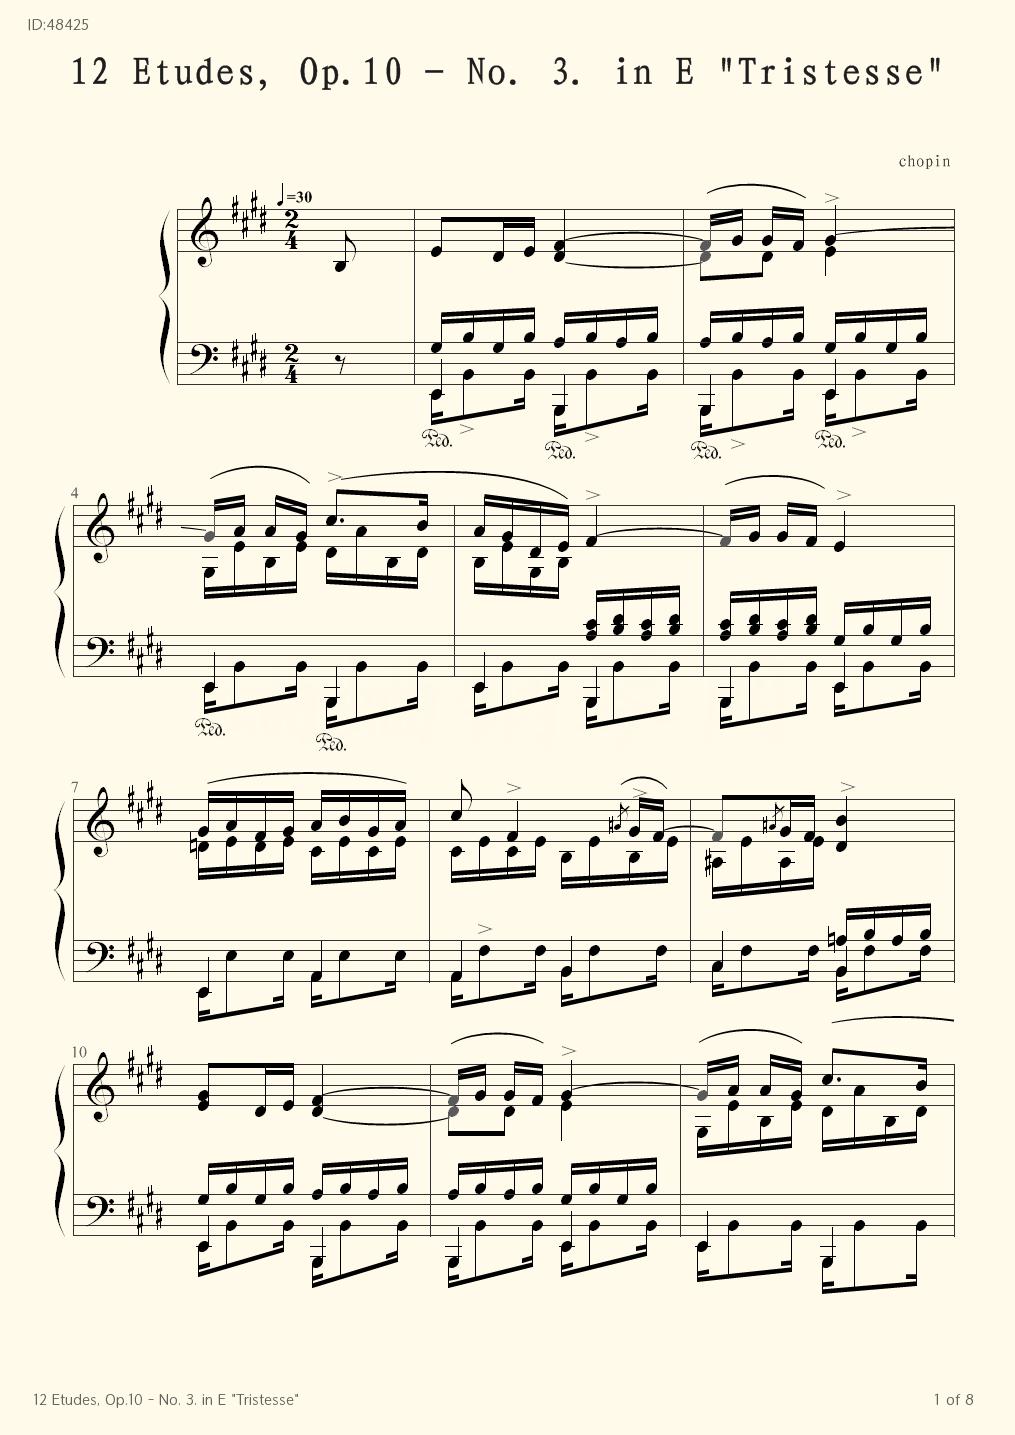 12 Etudes, Op.10 - No. 3. in E